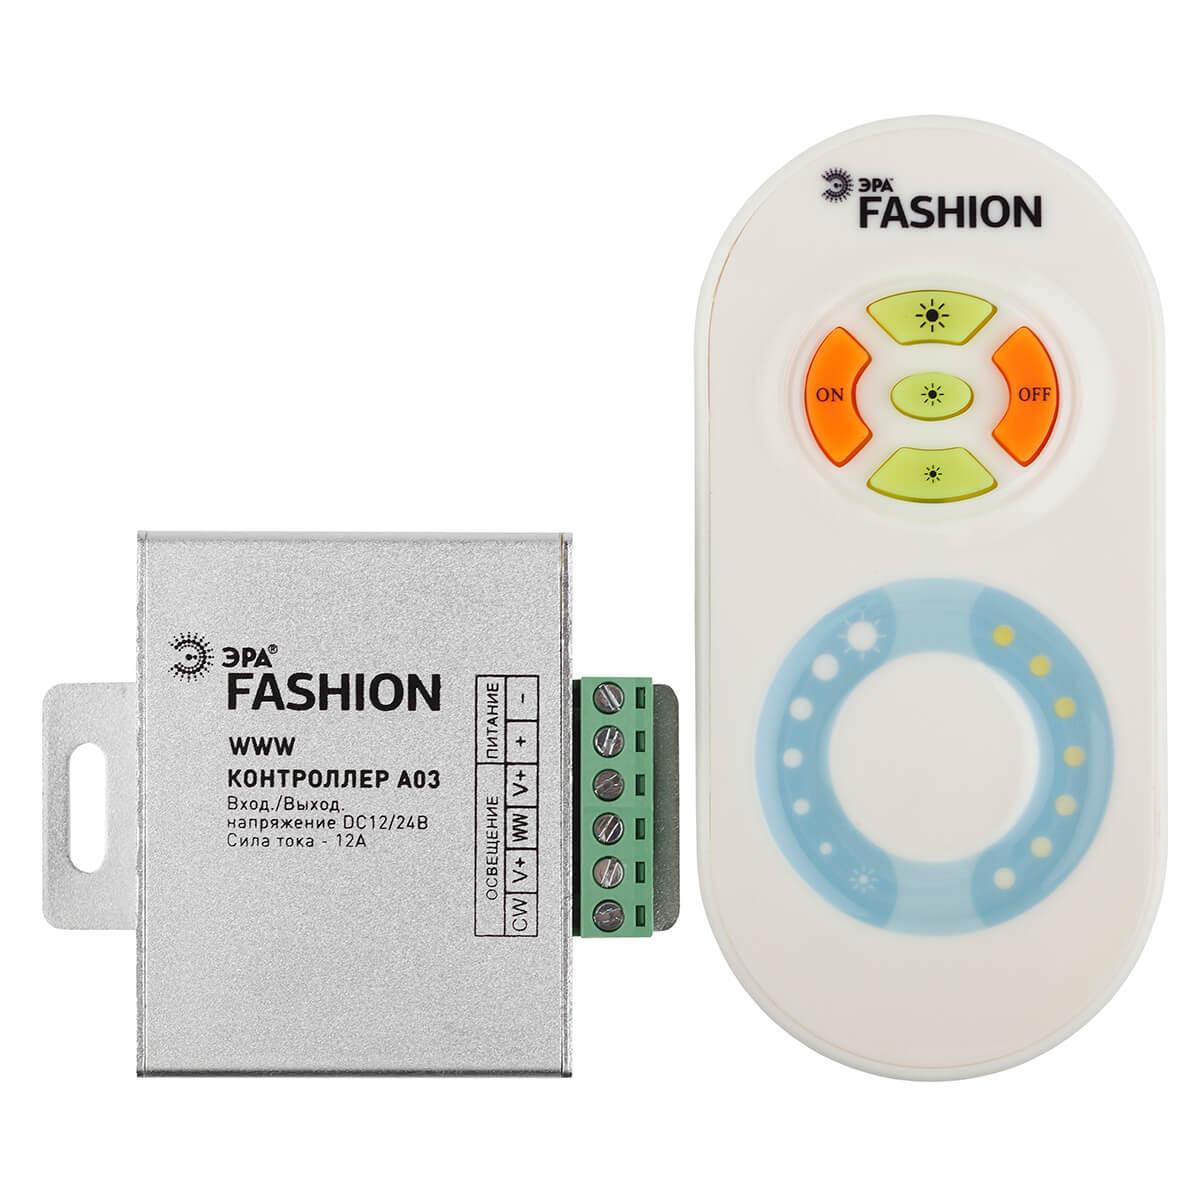 Контроллер для светодиодной WWW ленты ЭРА WWW controler-12-A03-RF platform fee of www 19gps net